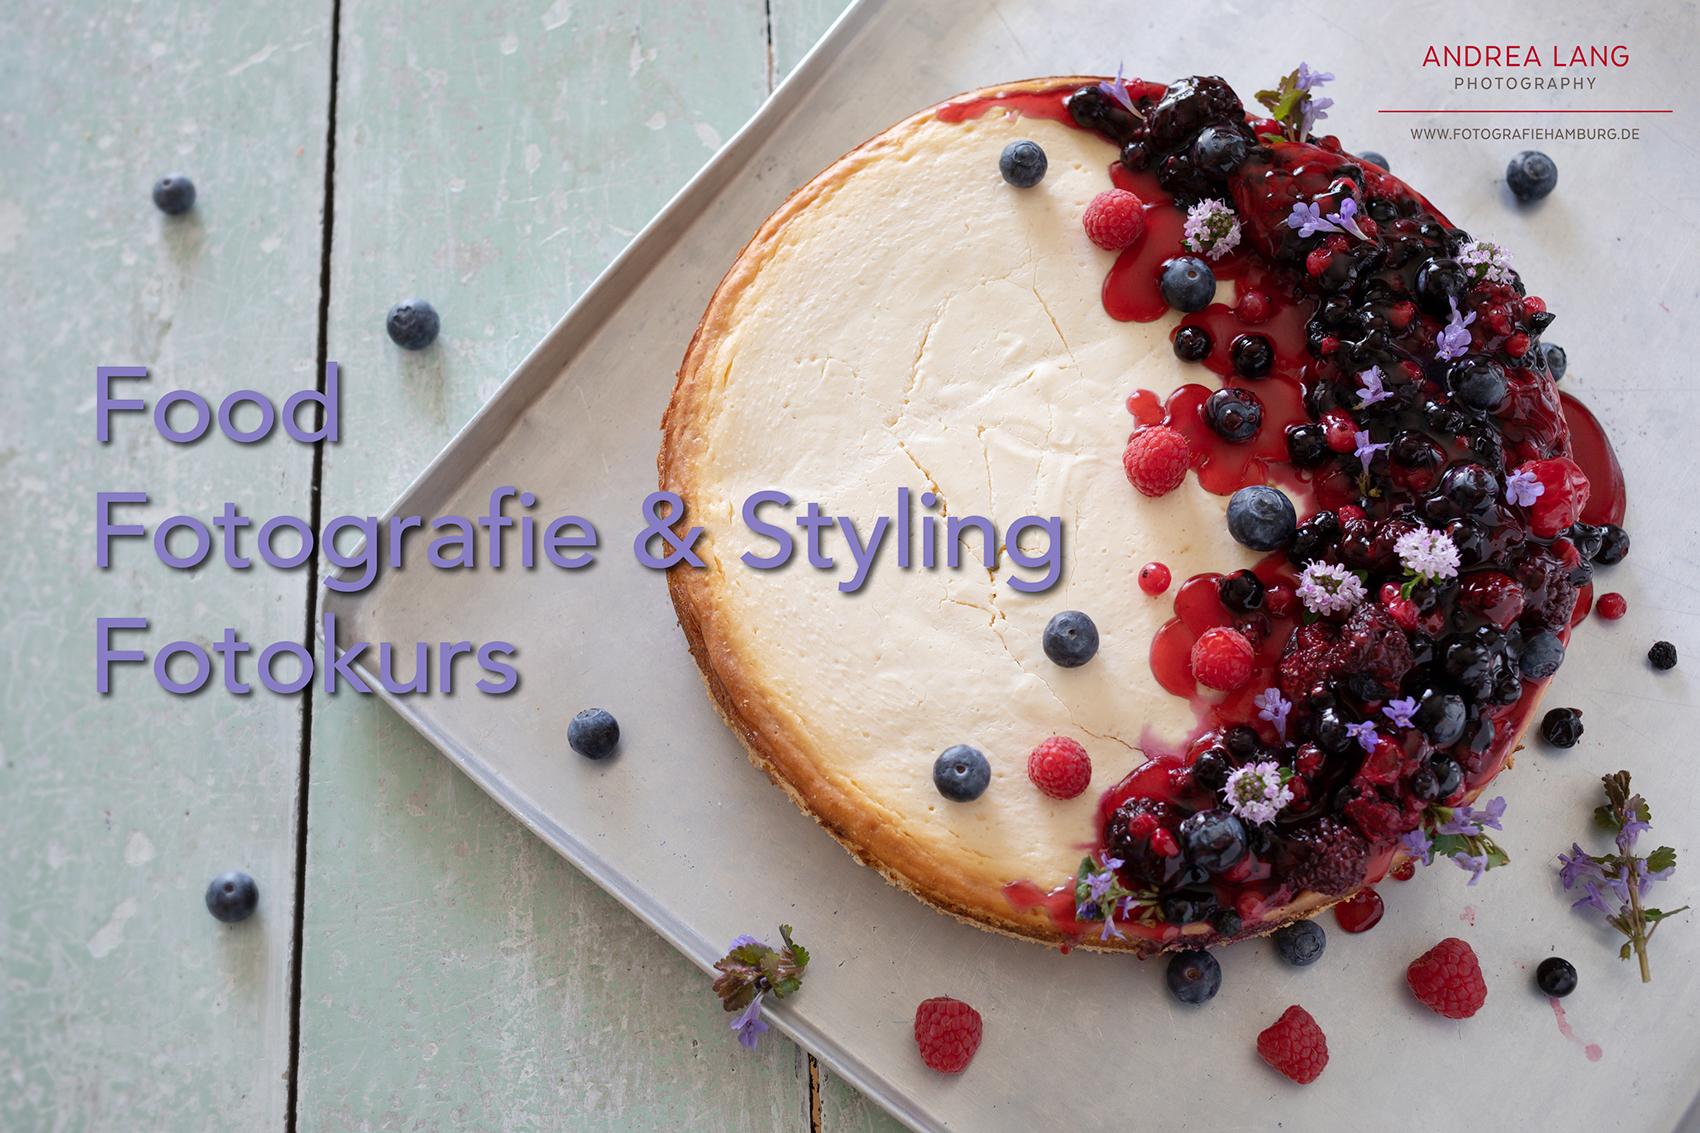 Food Fotografie & Styling Fotokurs